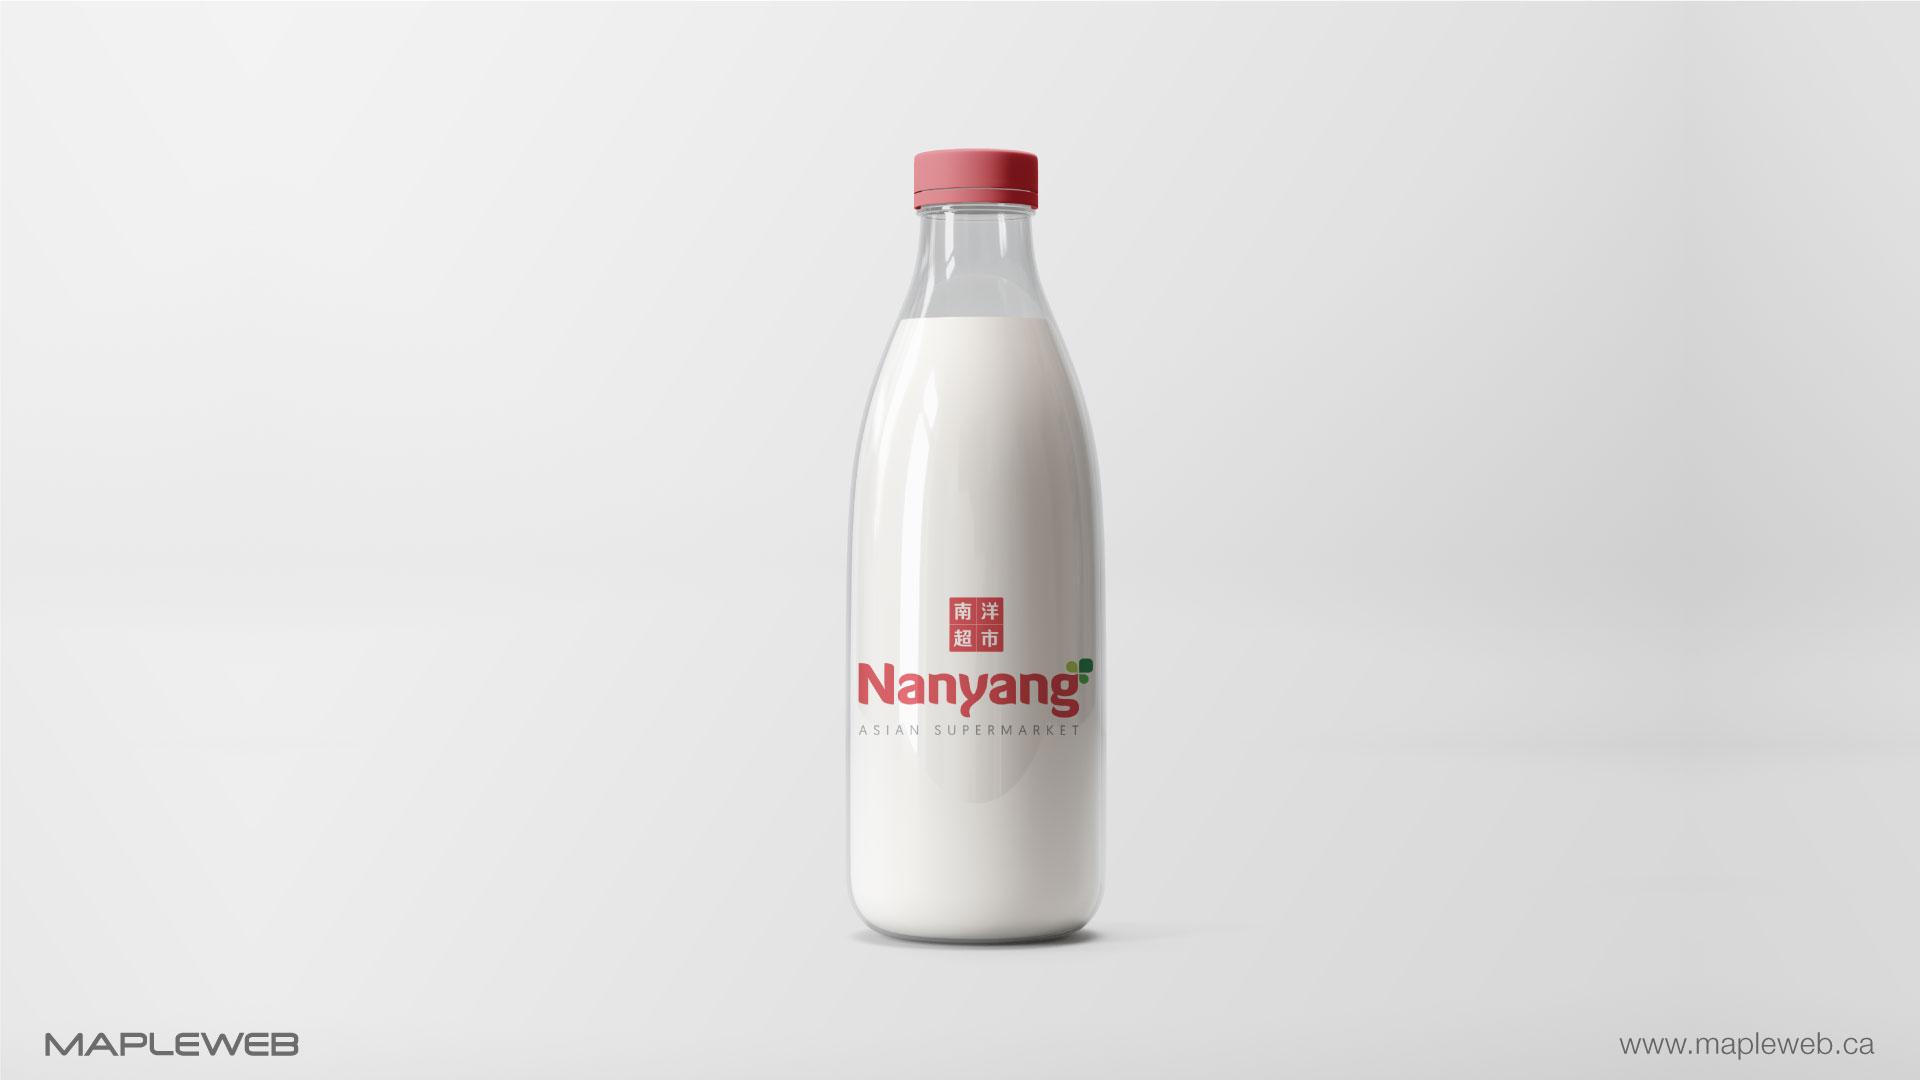 nanyang-brand-logo-design-by-mapleweb-vancouver-canada-milk-bottle-mock